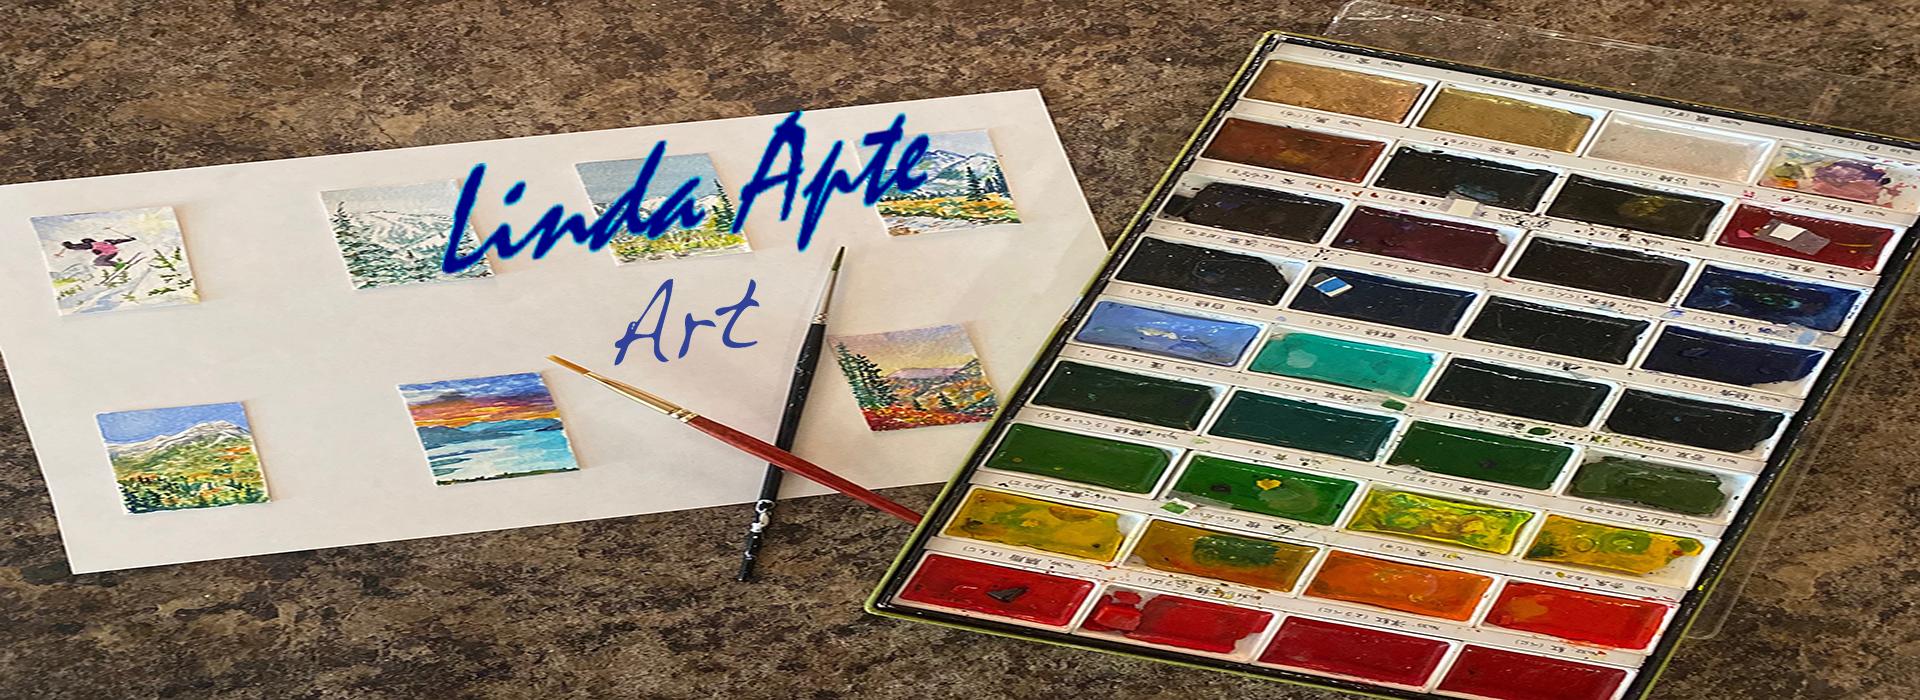 Linda Apte Art